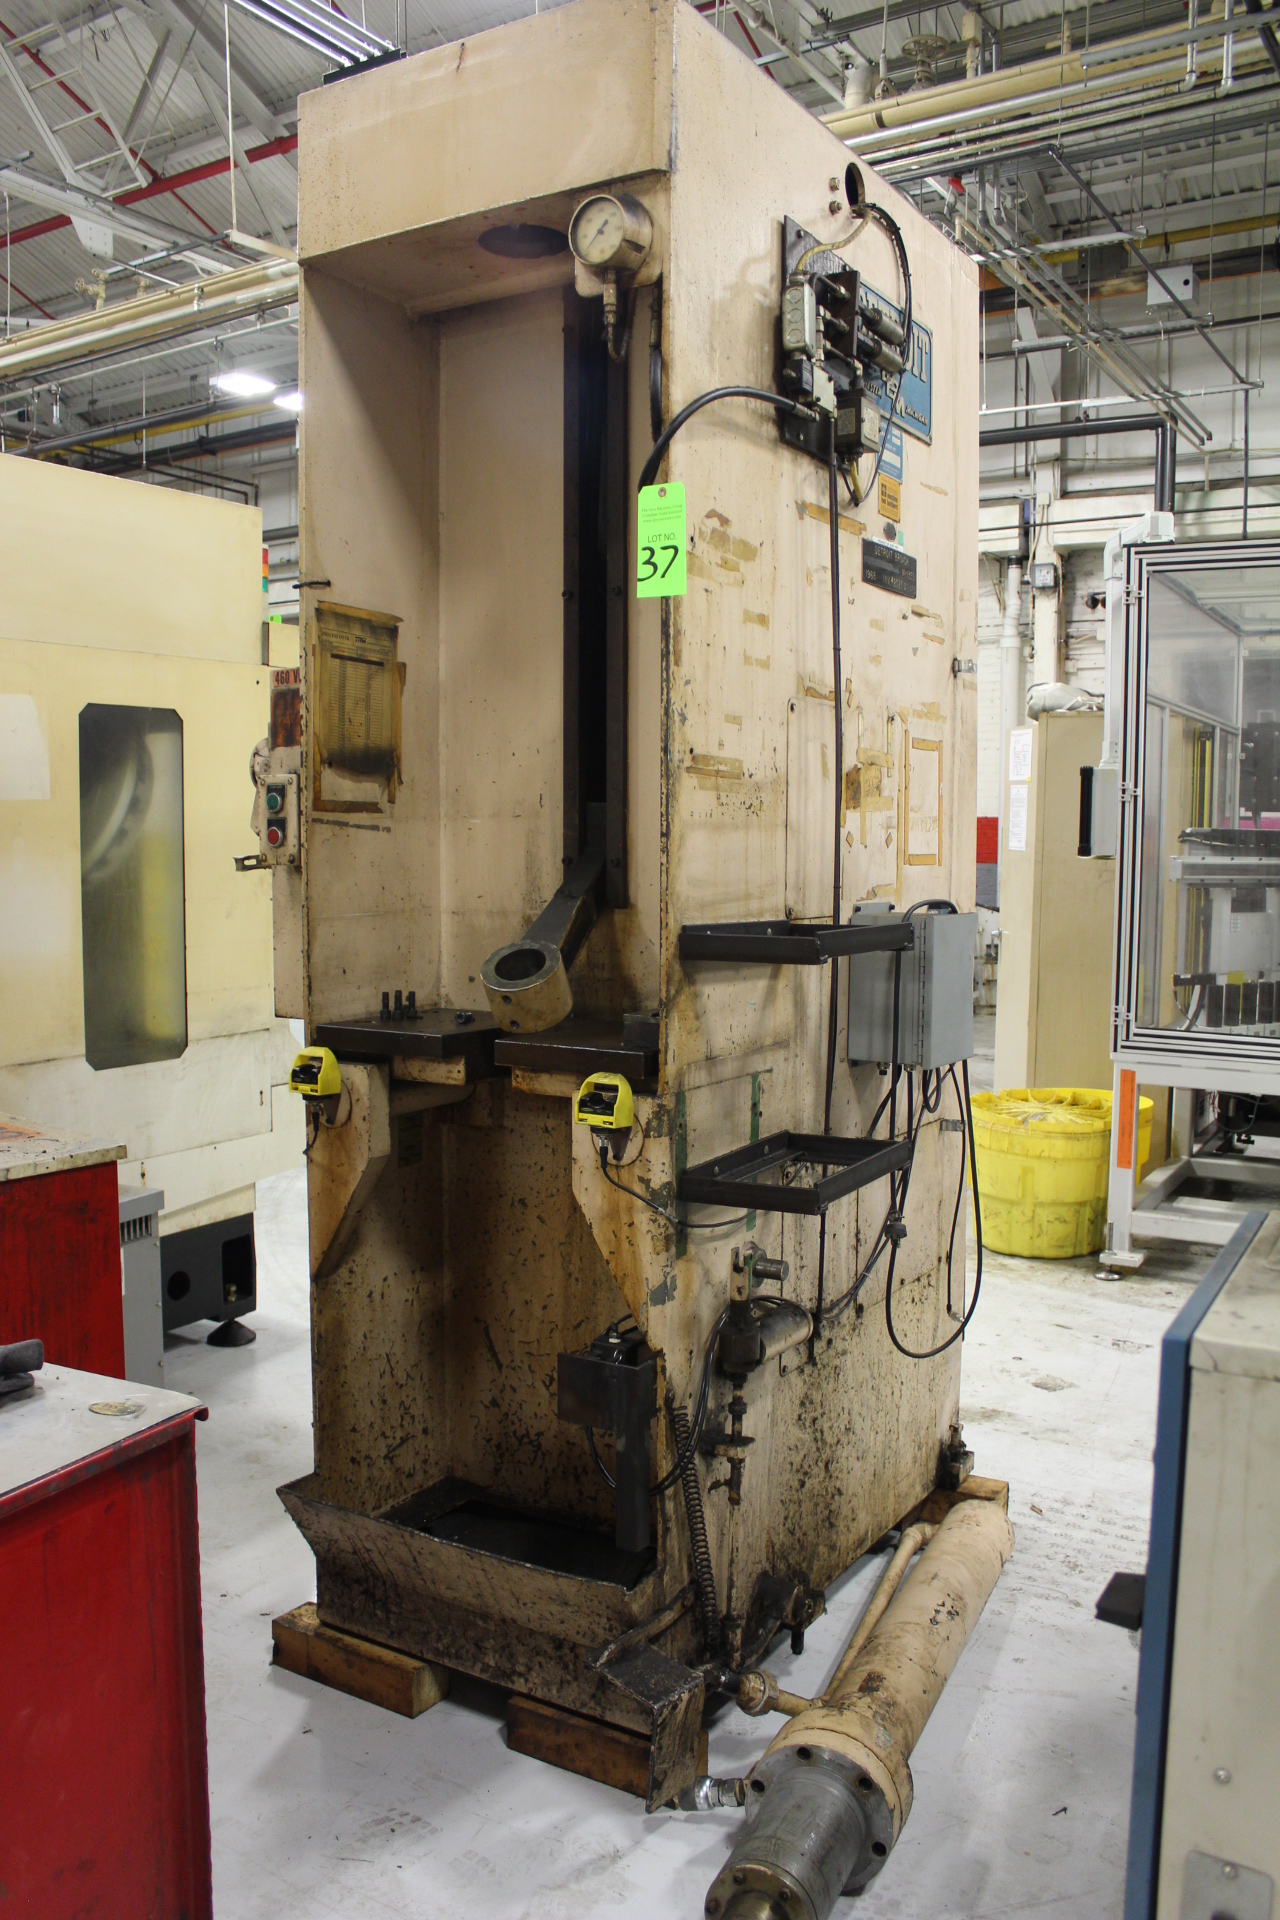 Lot 37 - Detroit Broach Model SPP Vertical Hydraulic Broach